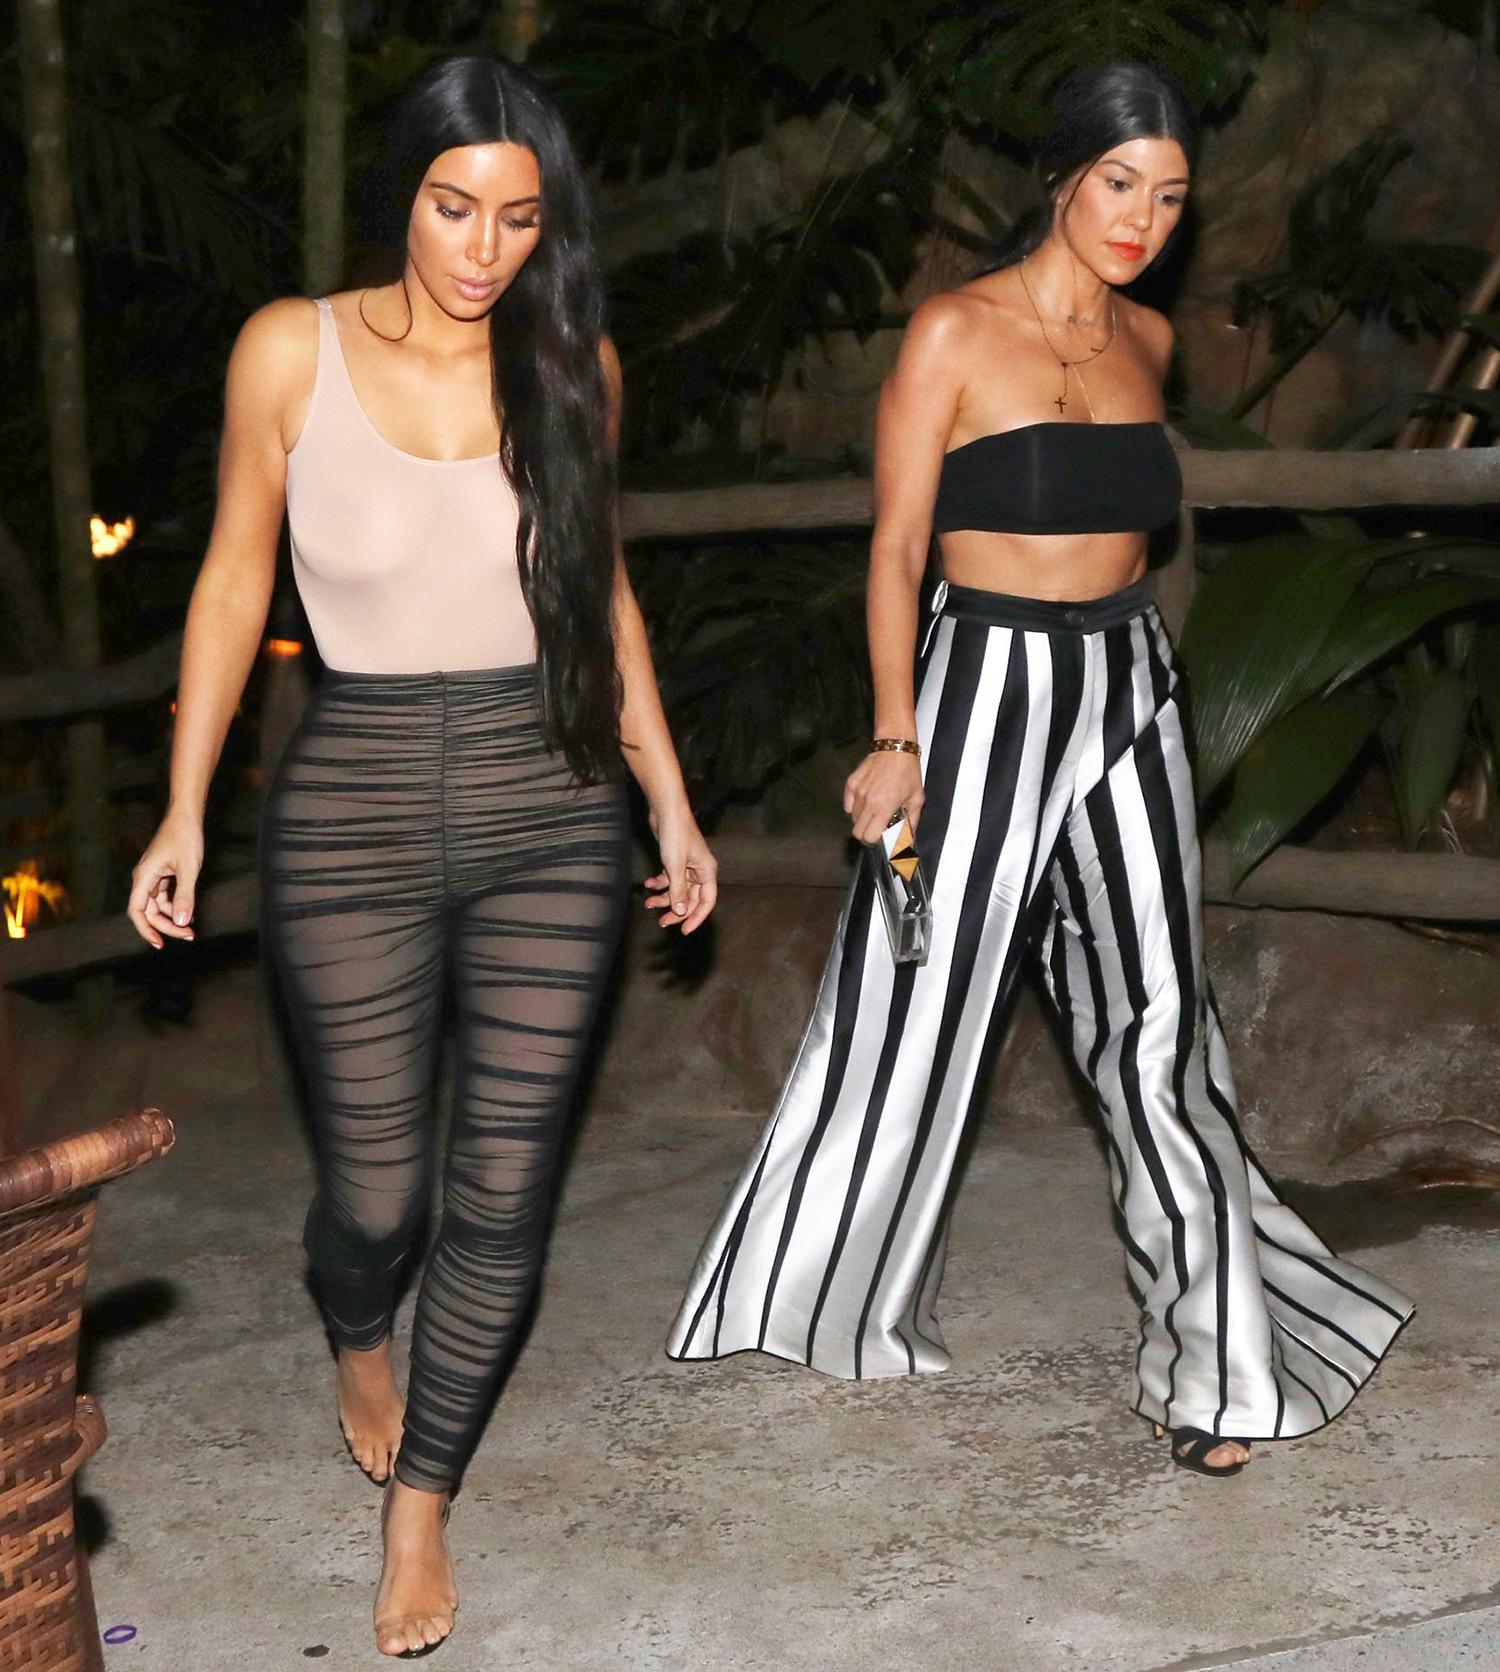 Kim Kardashian and Kourtney Kardashian